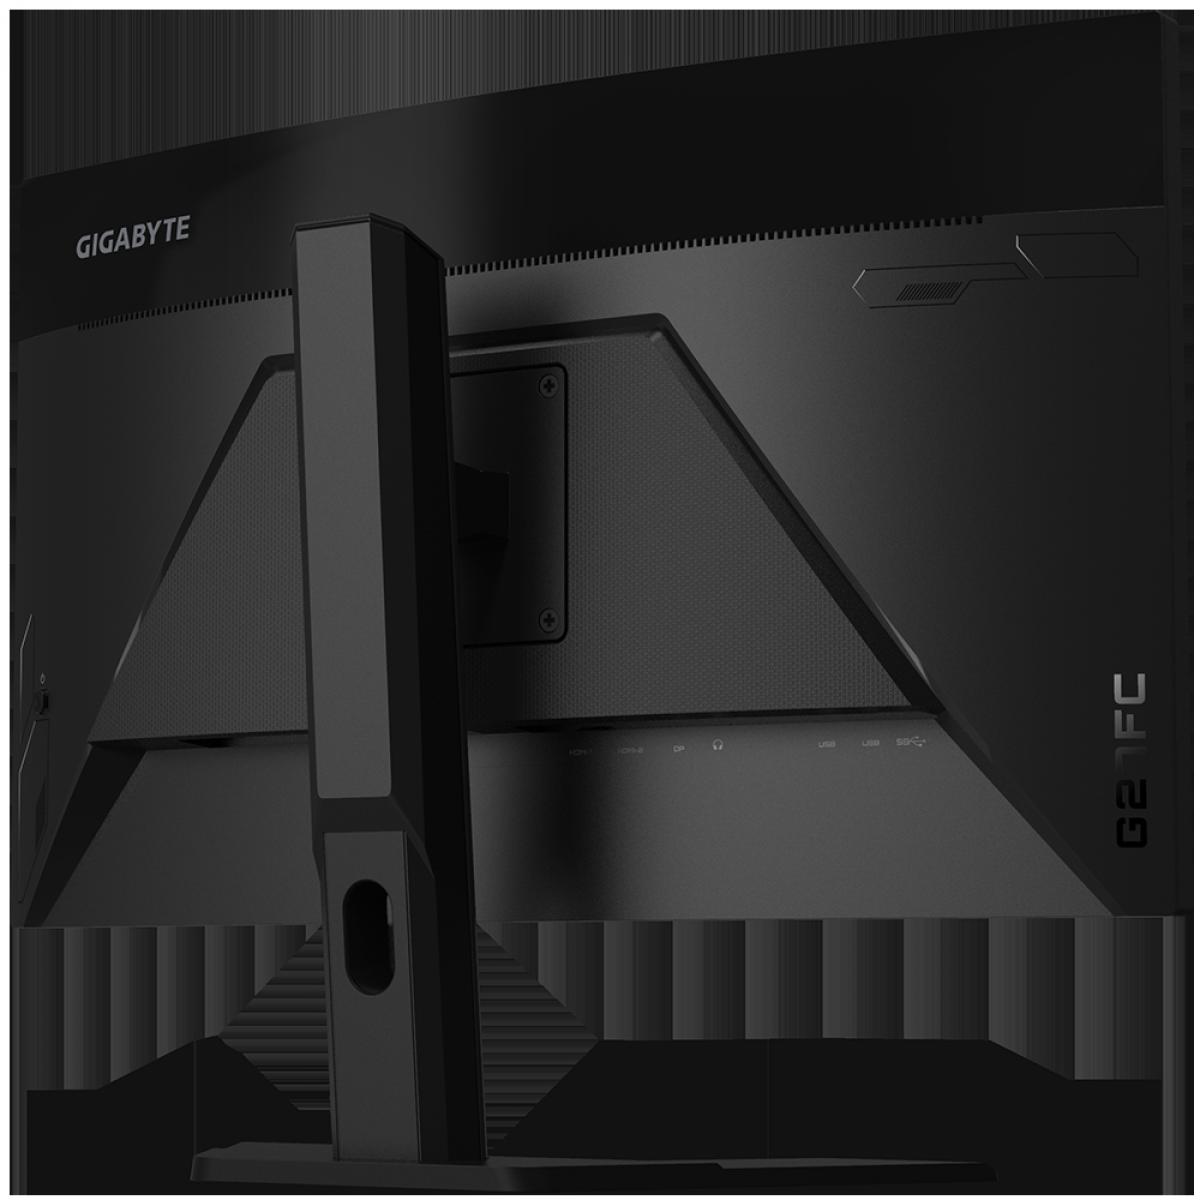 Monitor Gamer Gigabyte G27FC, 27 Pol, FullHD, 165Hz, 1ms, VA, FreeSync, DP/HDMIx2, 20VM0-GG27FCBT-1SAR